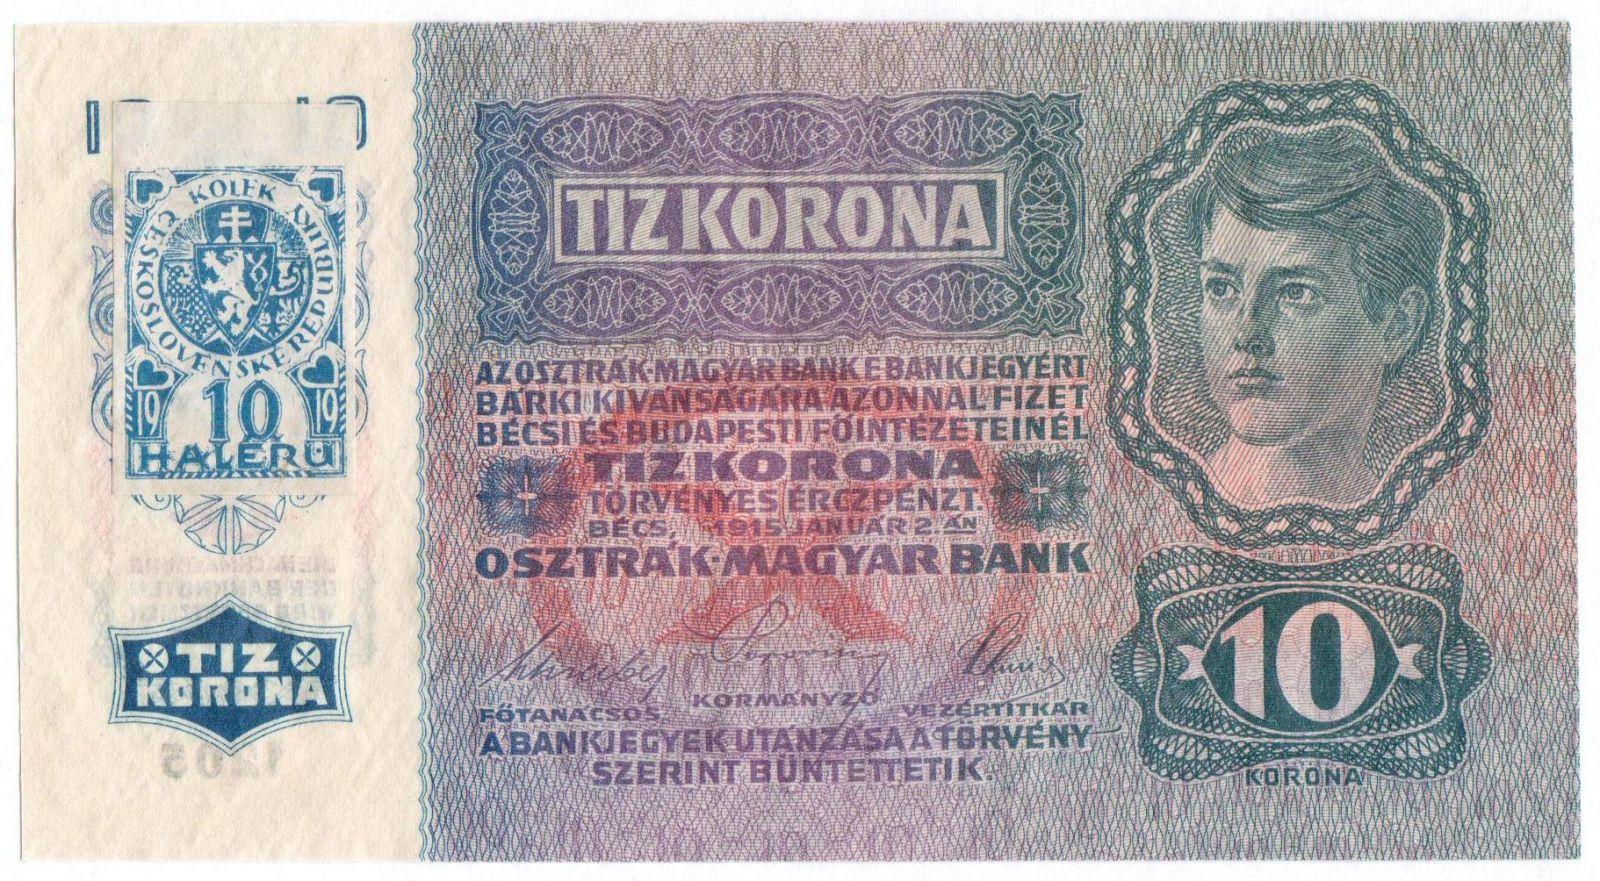 10Kč/1915-18, kolek ČSR/, stav UNC, série 1205